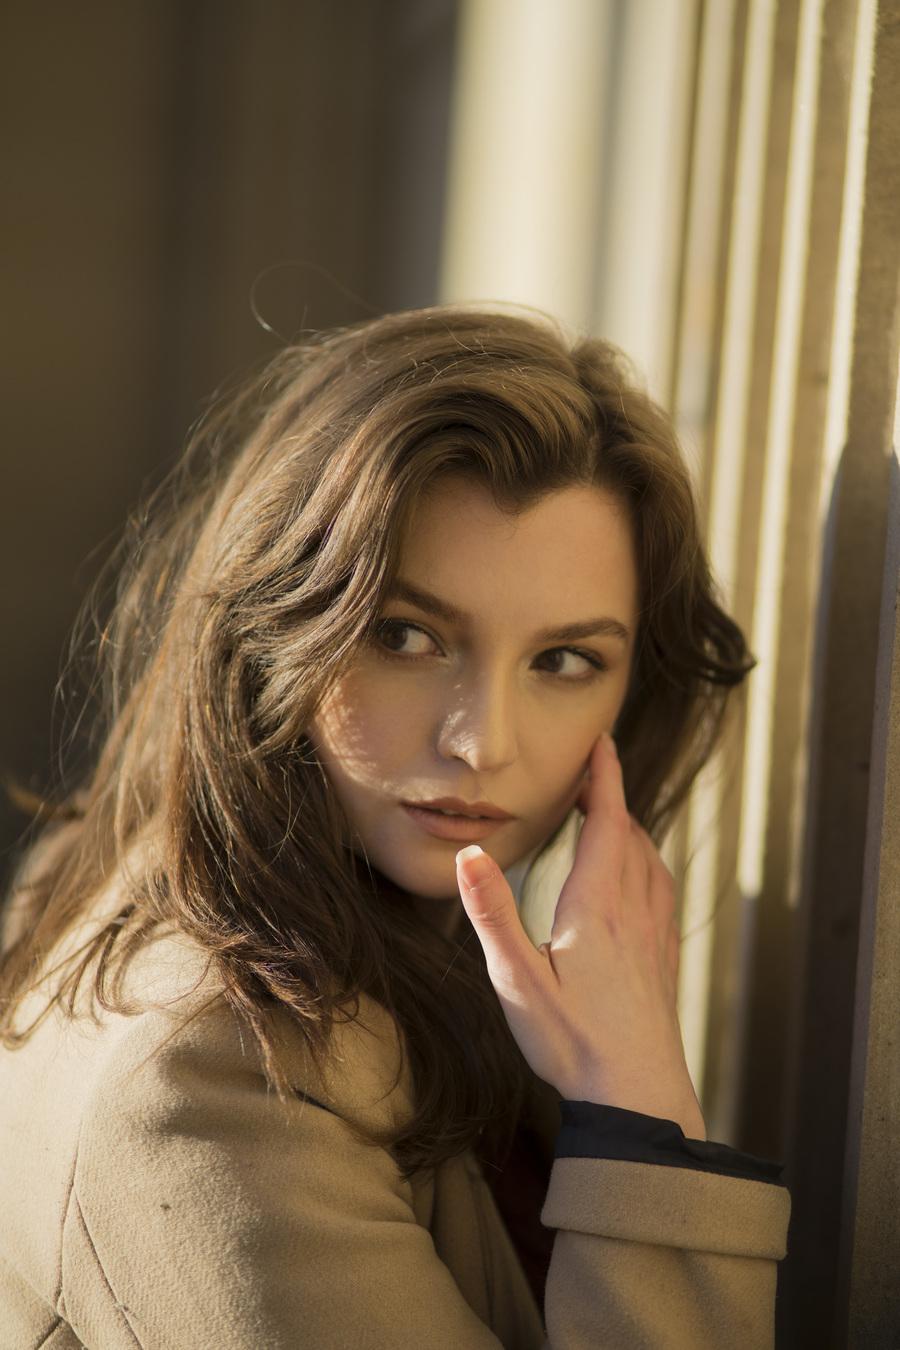 Photography by ablaze, Model Celine Eloise1 / Uploaded 16th January 2020 @ 09:57 PM